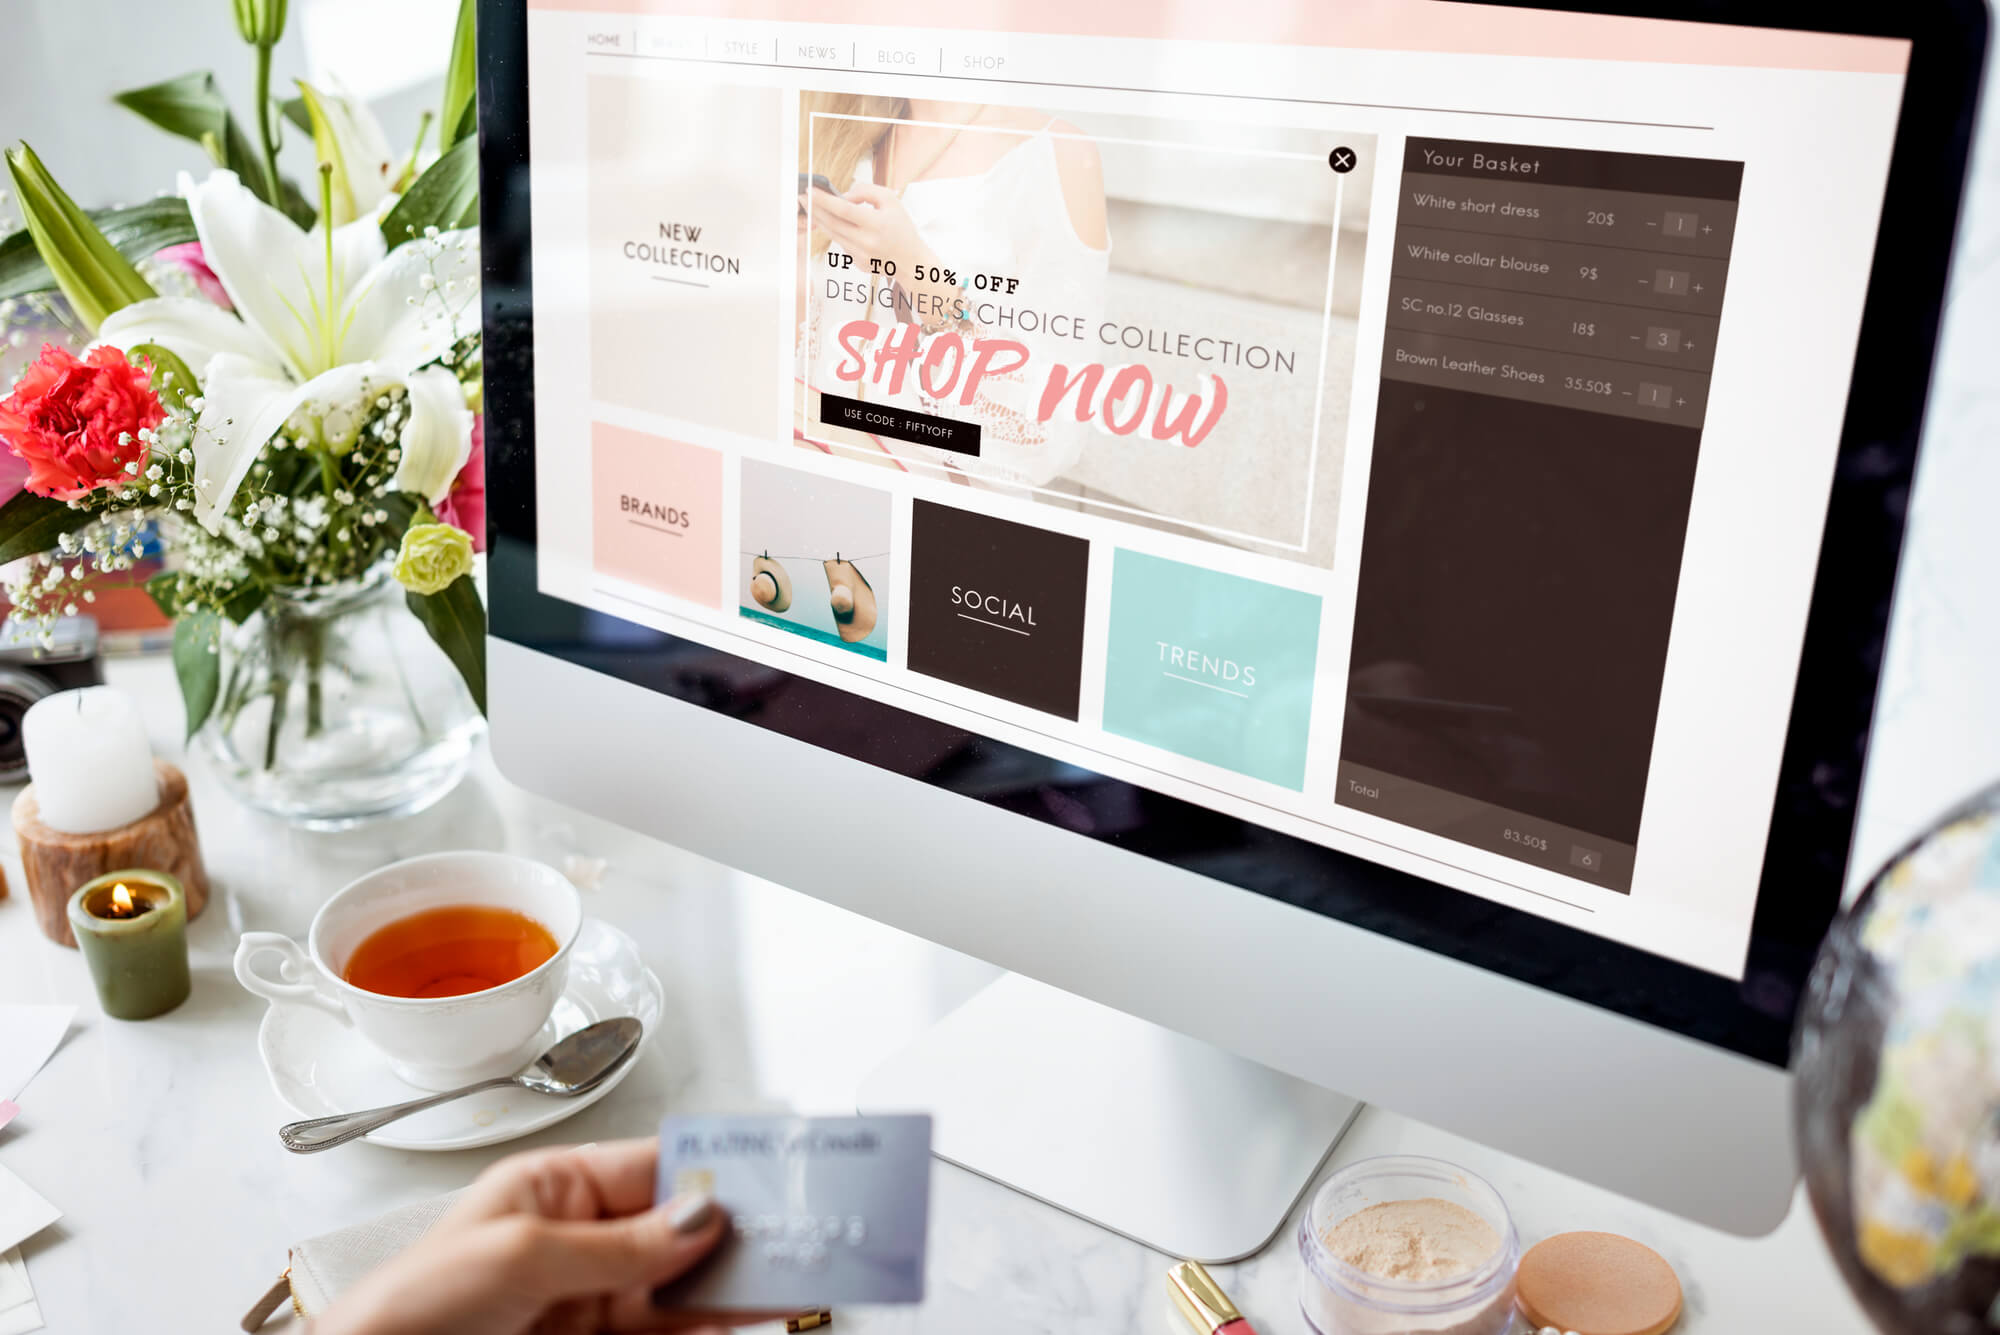 Plataforma de e-commerce: entenda como migrar e evitar problemas